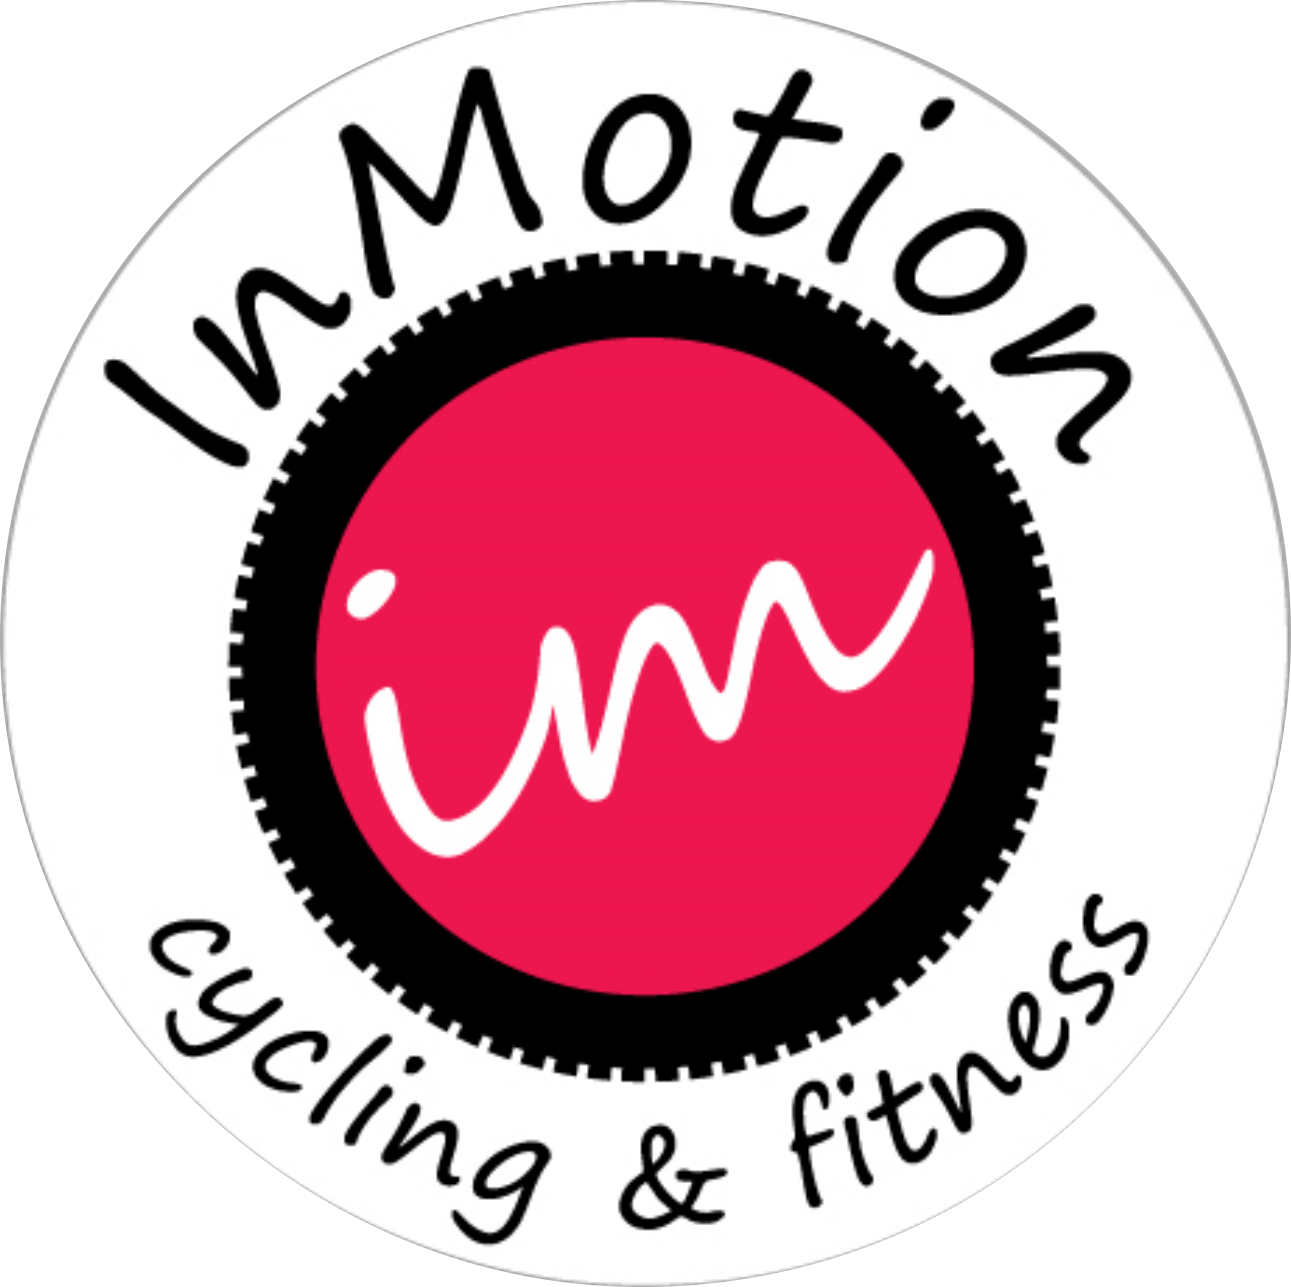 InMotion Cycling & Fitness Studio